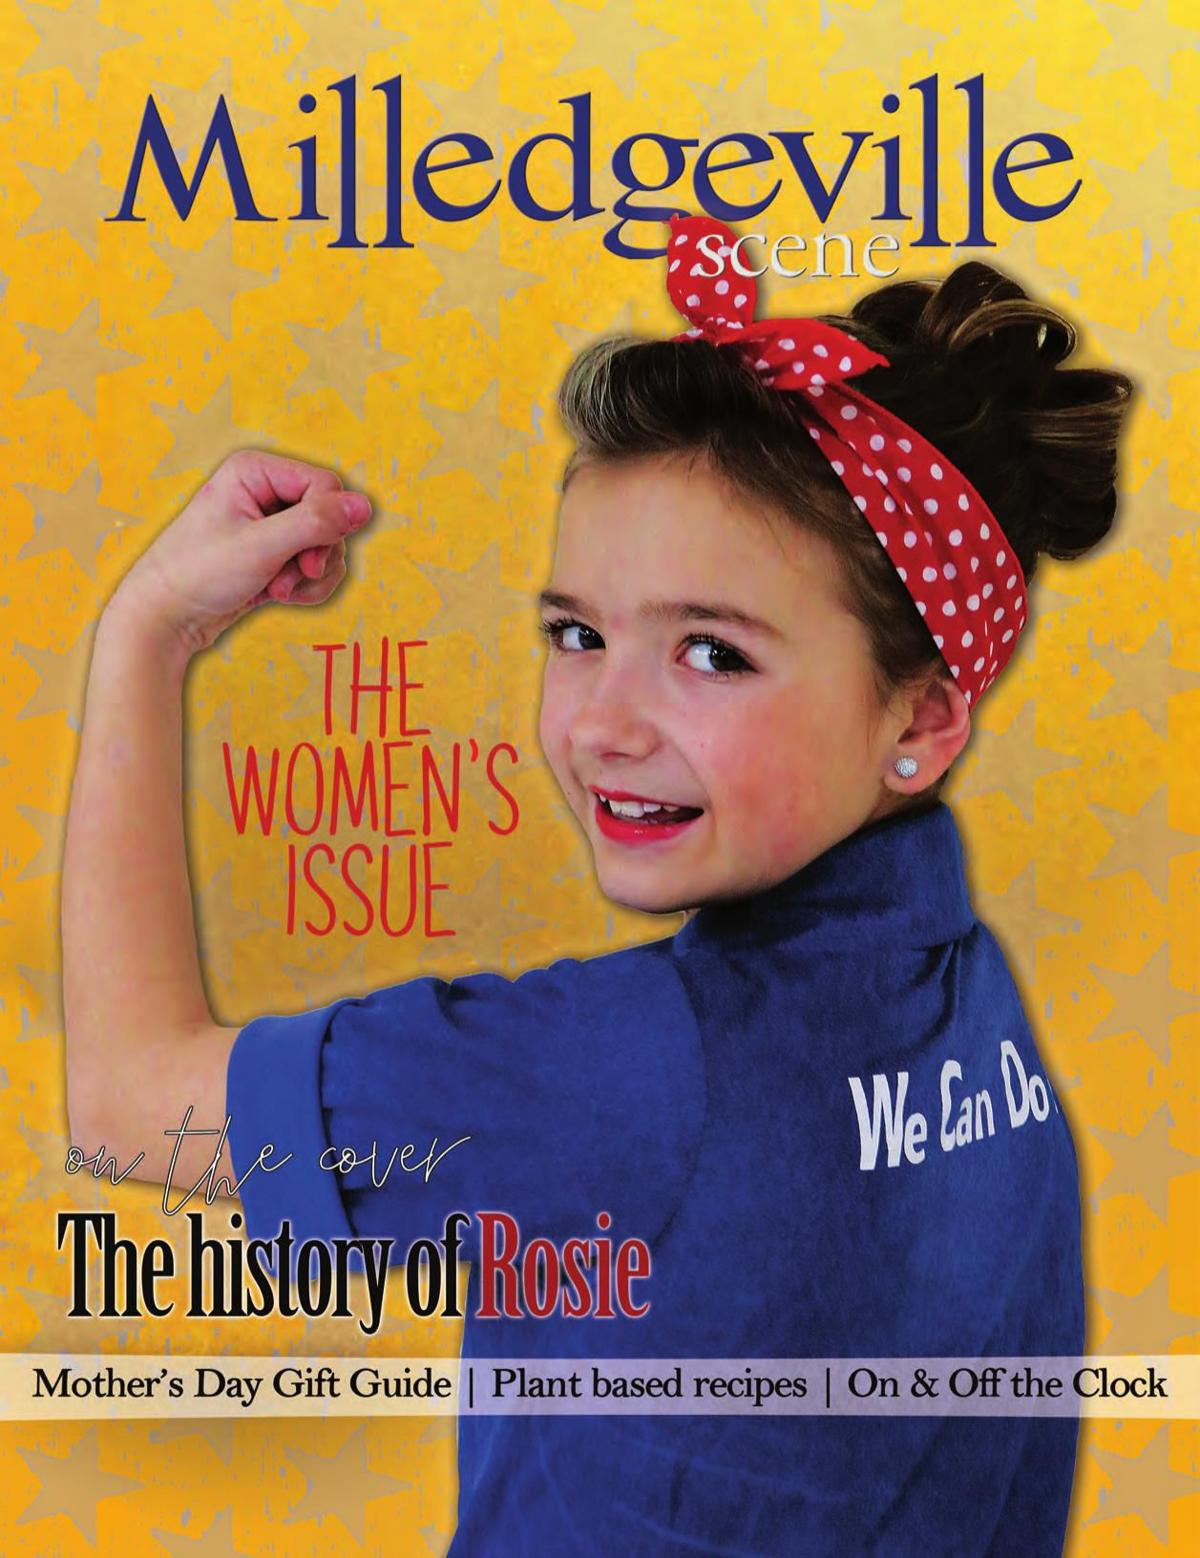 Milledgeville Scene Women's Issue